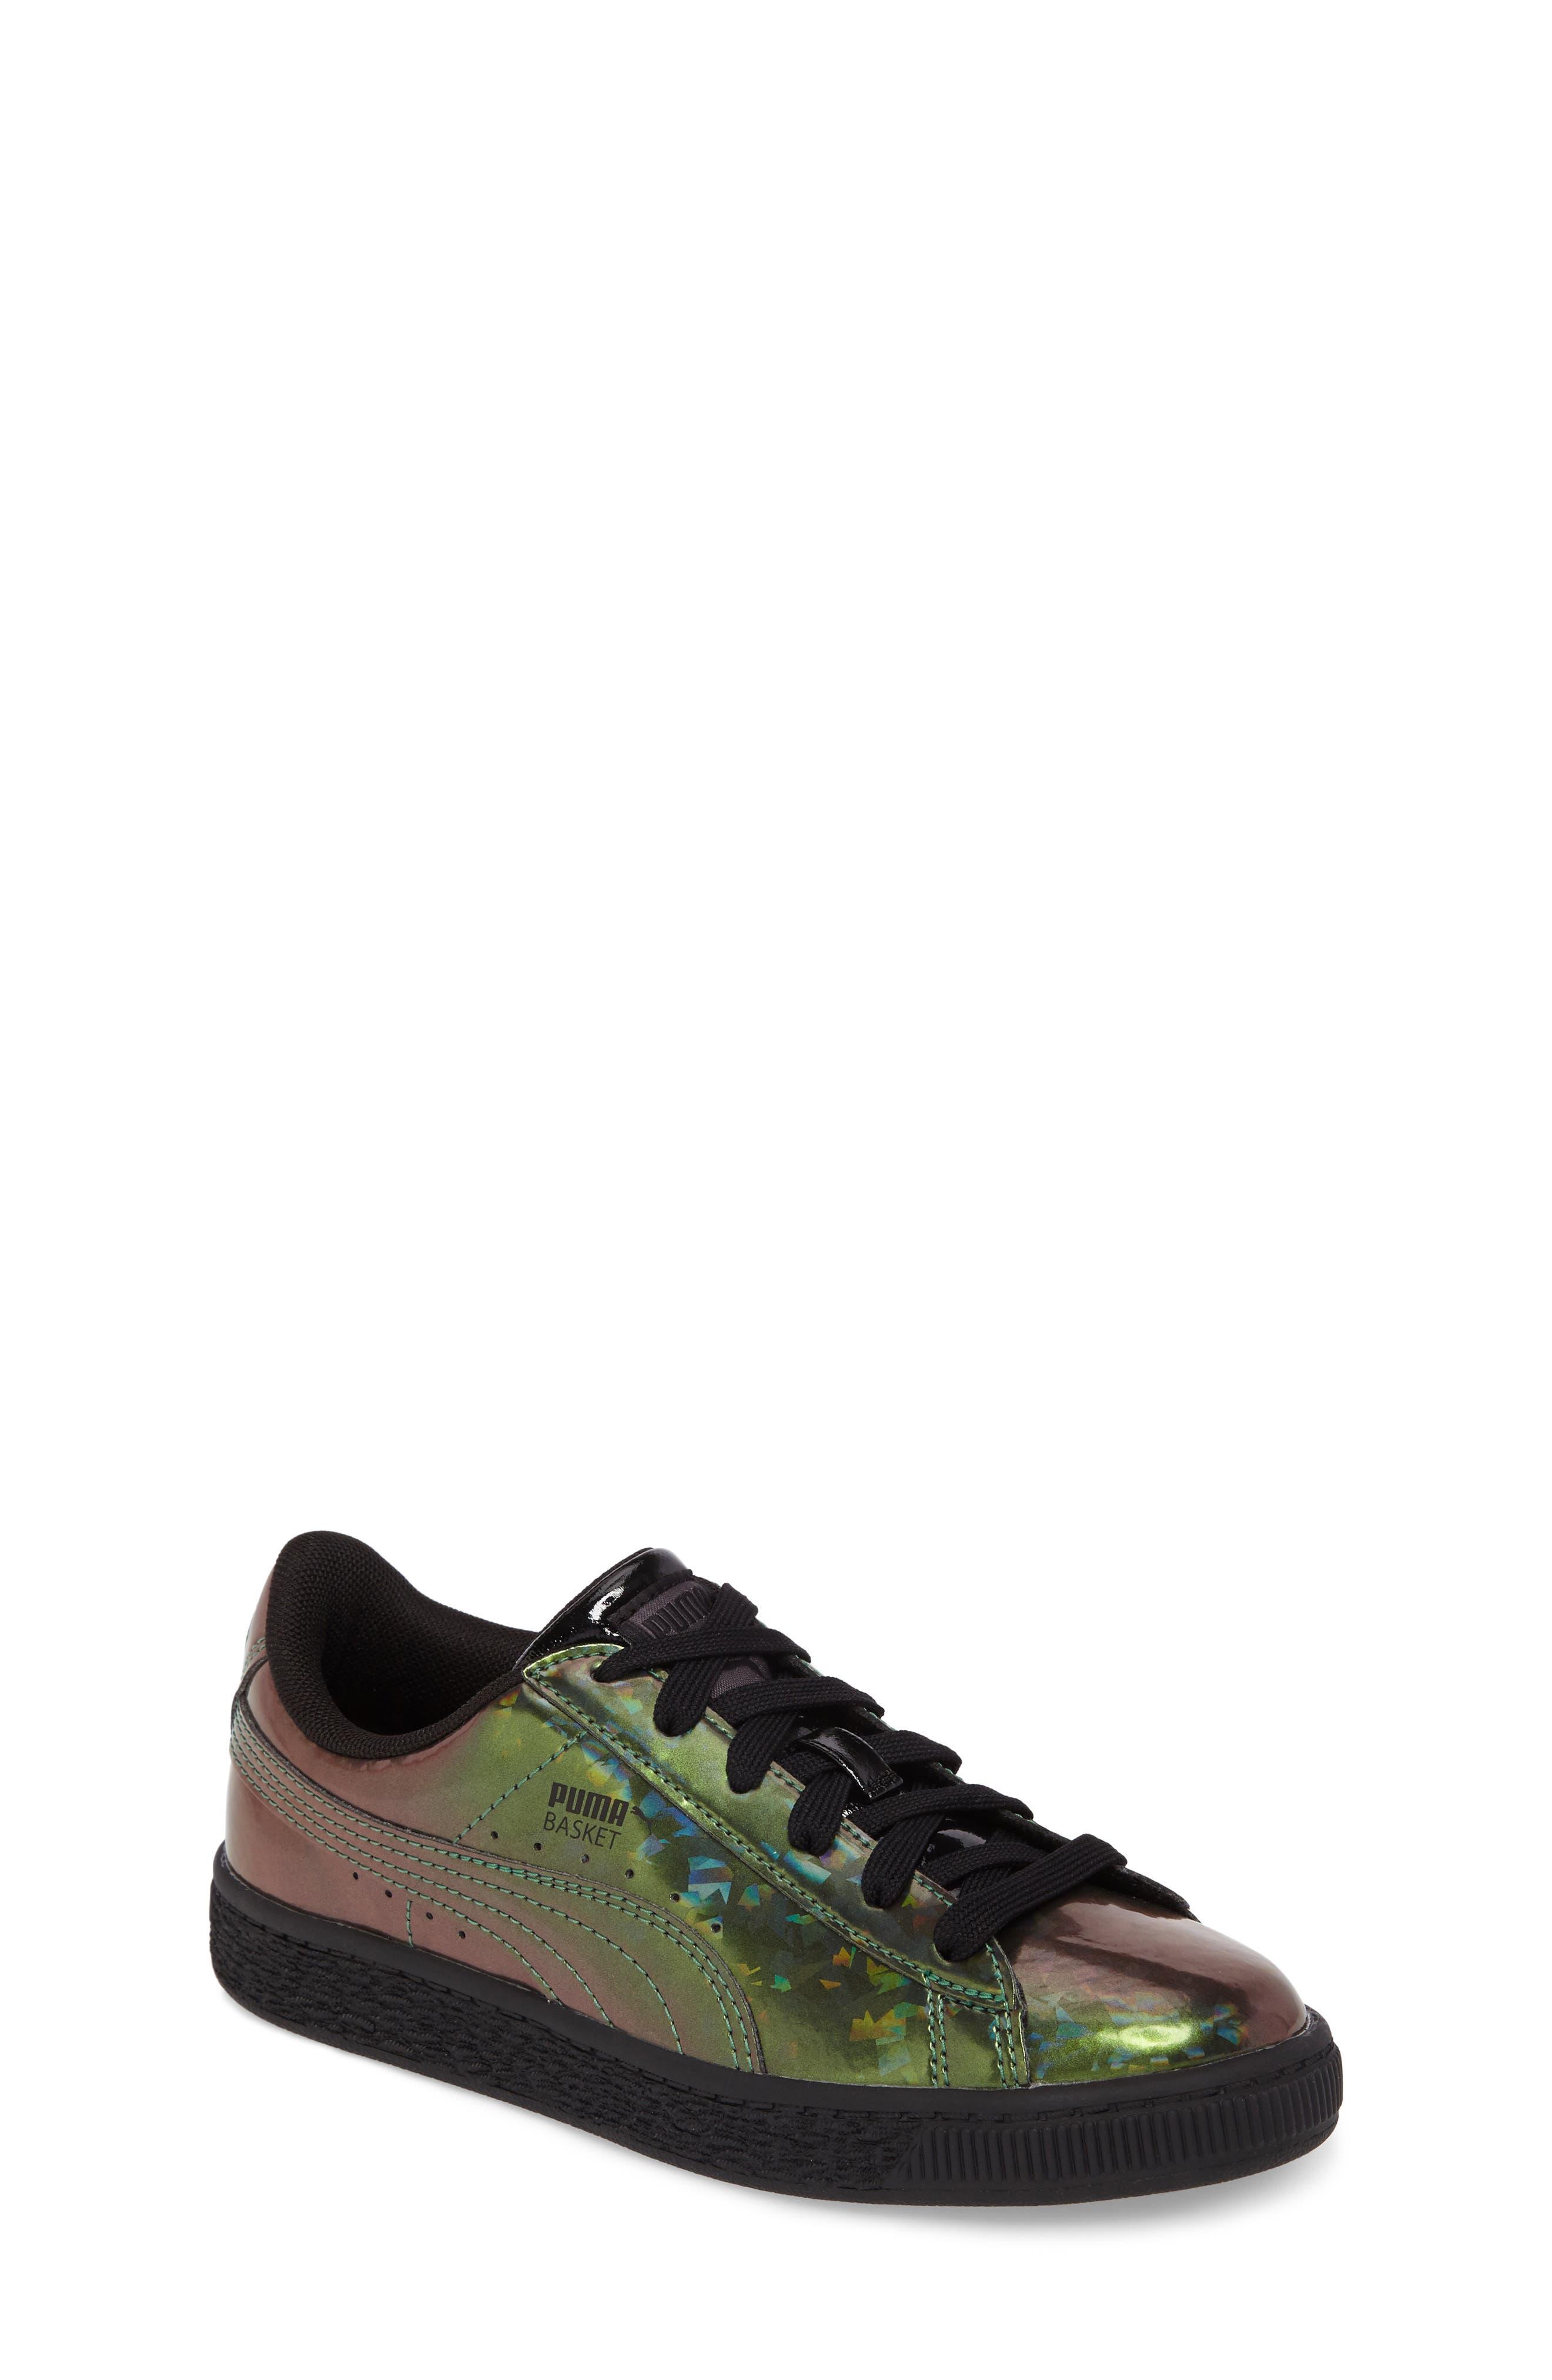 Basket Classic Holo PS Sneaker,                             Main thumbnail 1, color,                             Black/ Black